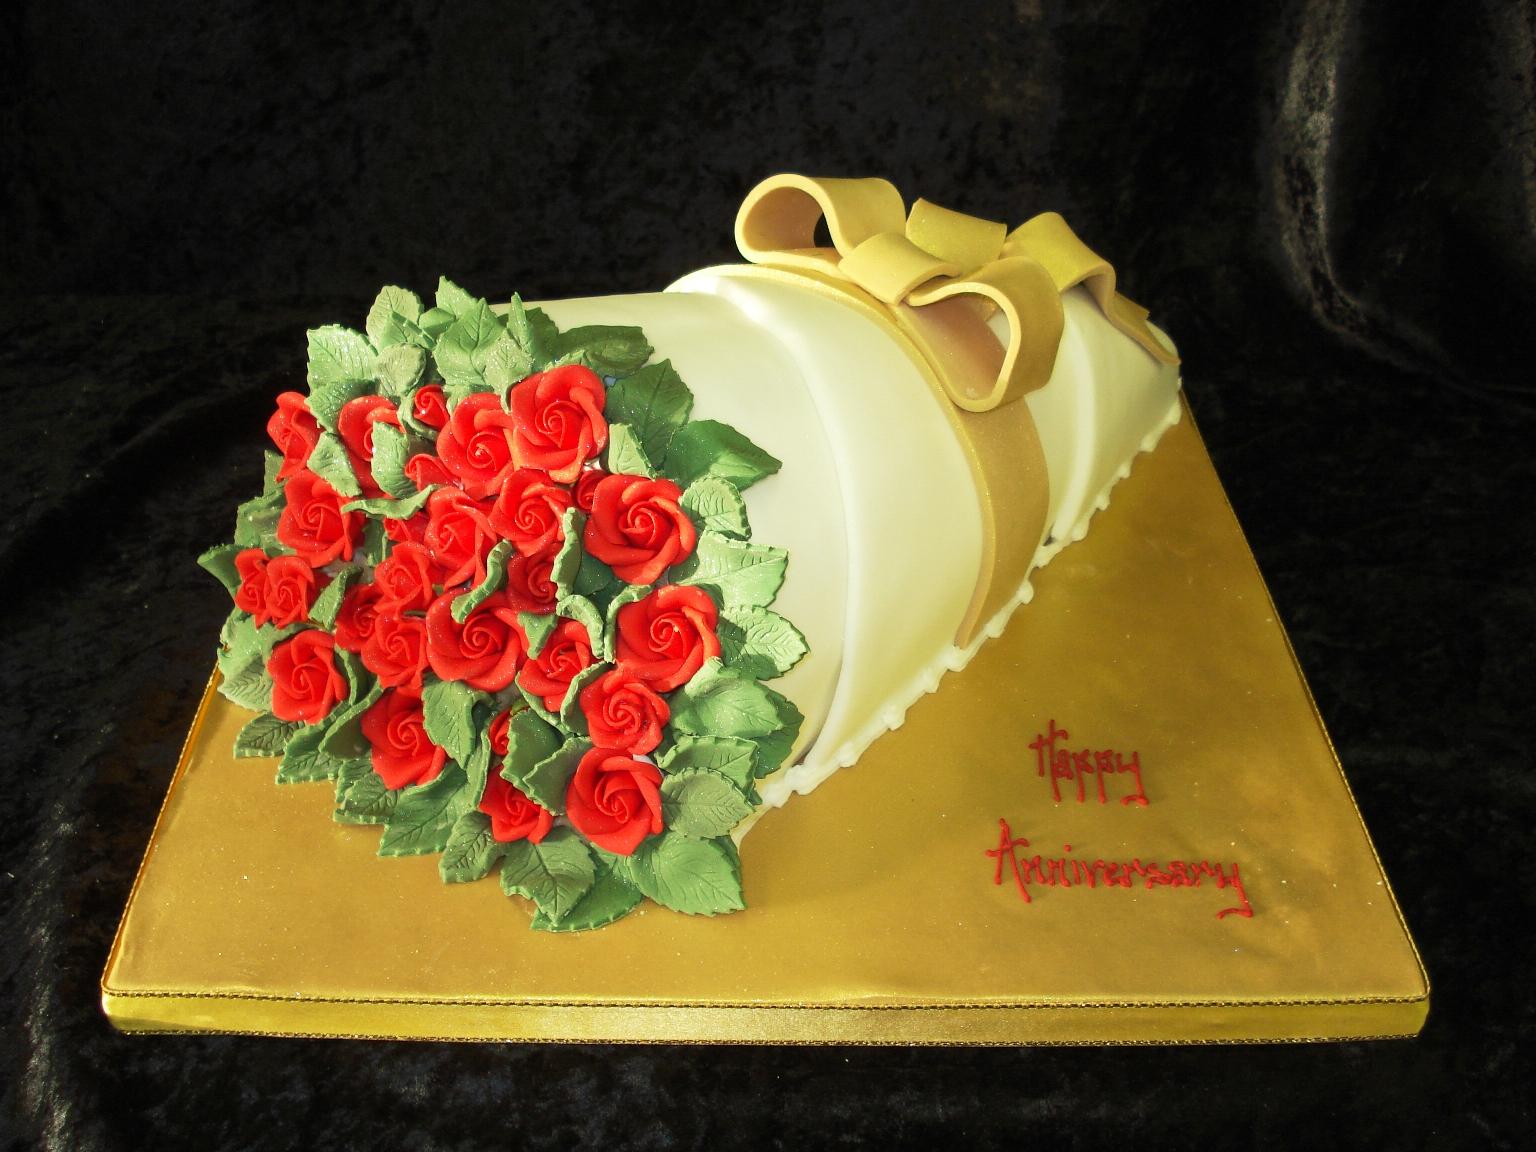 Roses birthday cakes izmirmasajfo